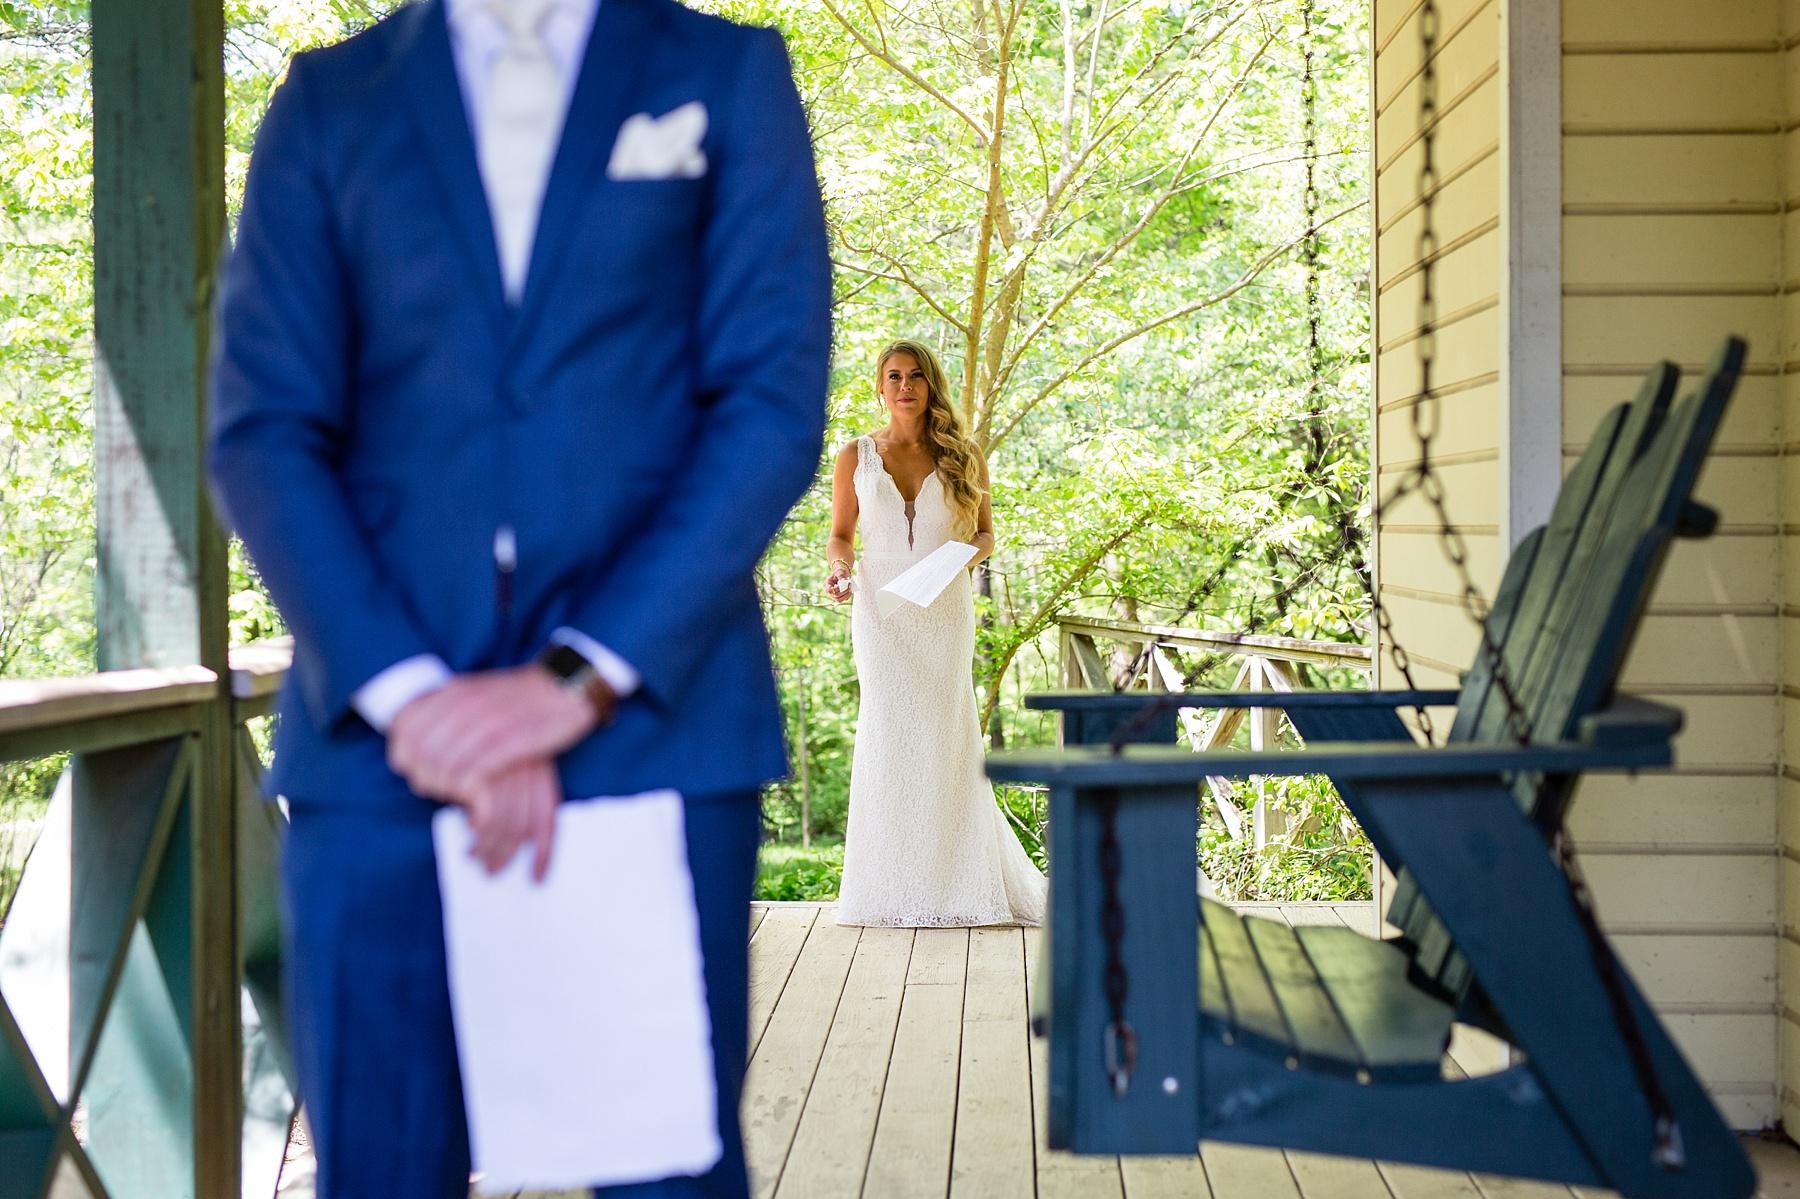 Brandon_Shafer_Photography_Kara_Doug_12_corners_Wedding_Benton_Harbor_0017.jpg